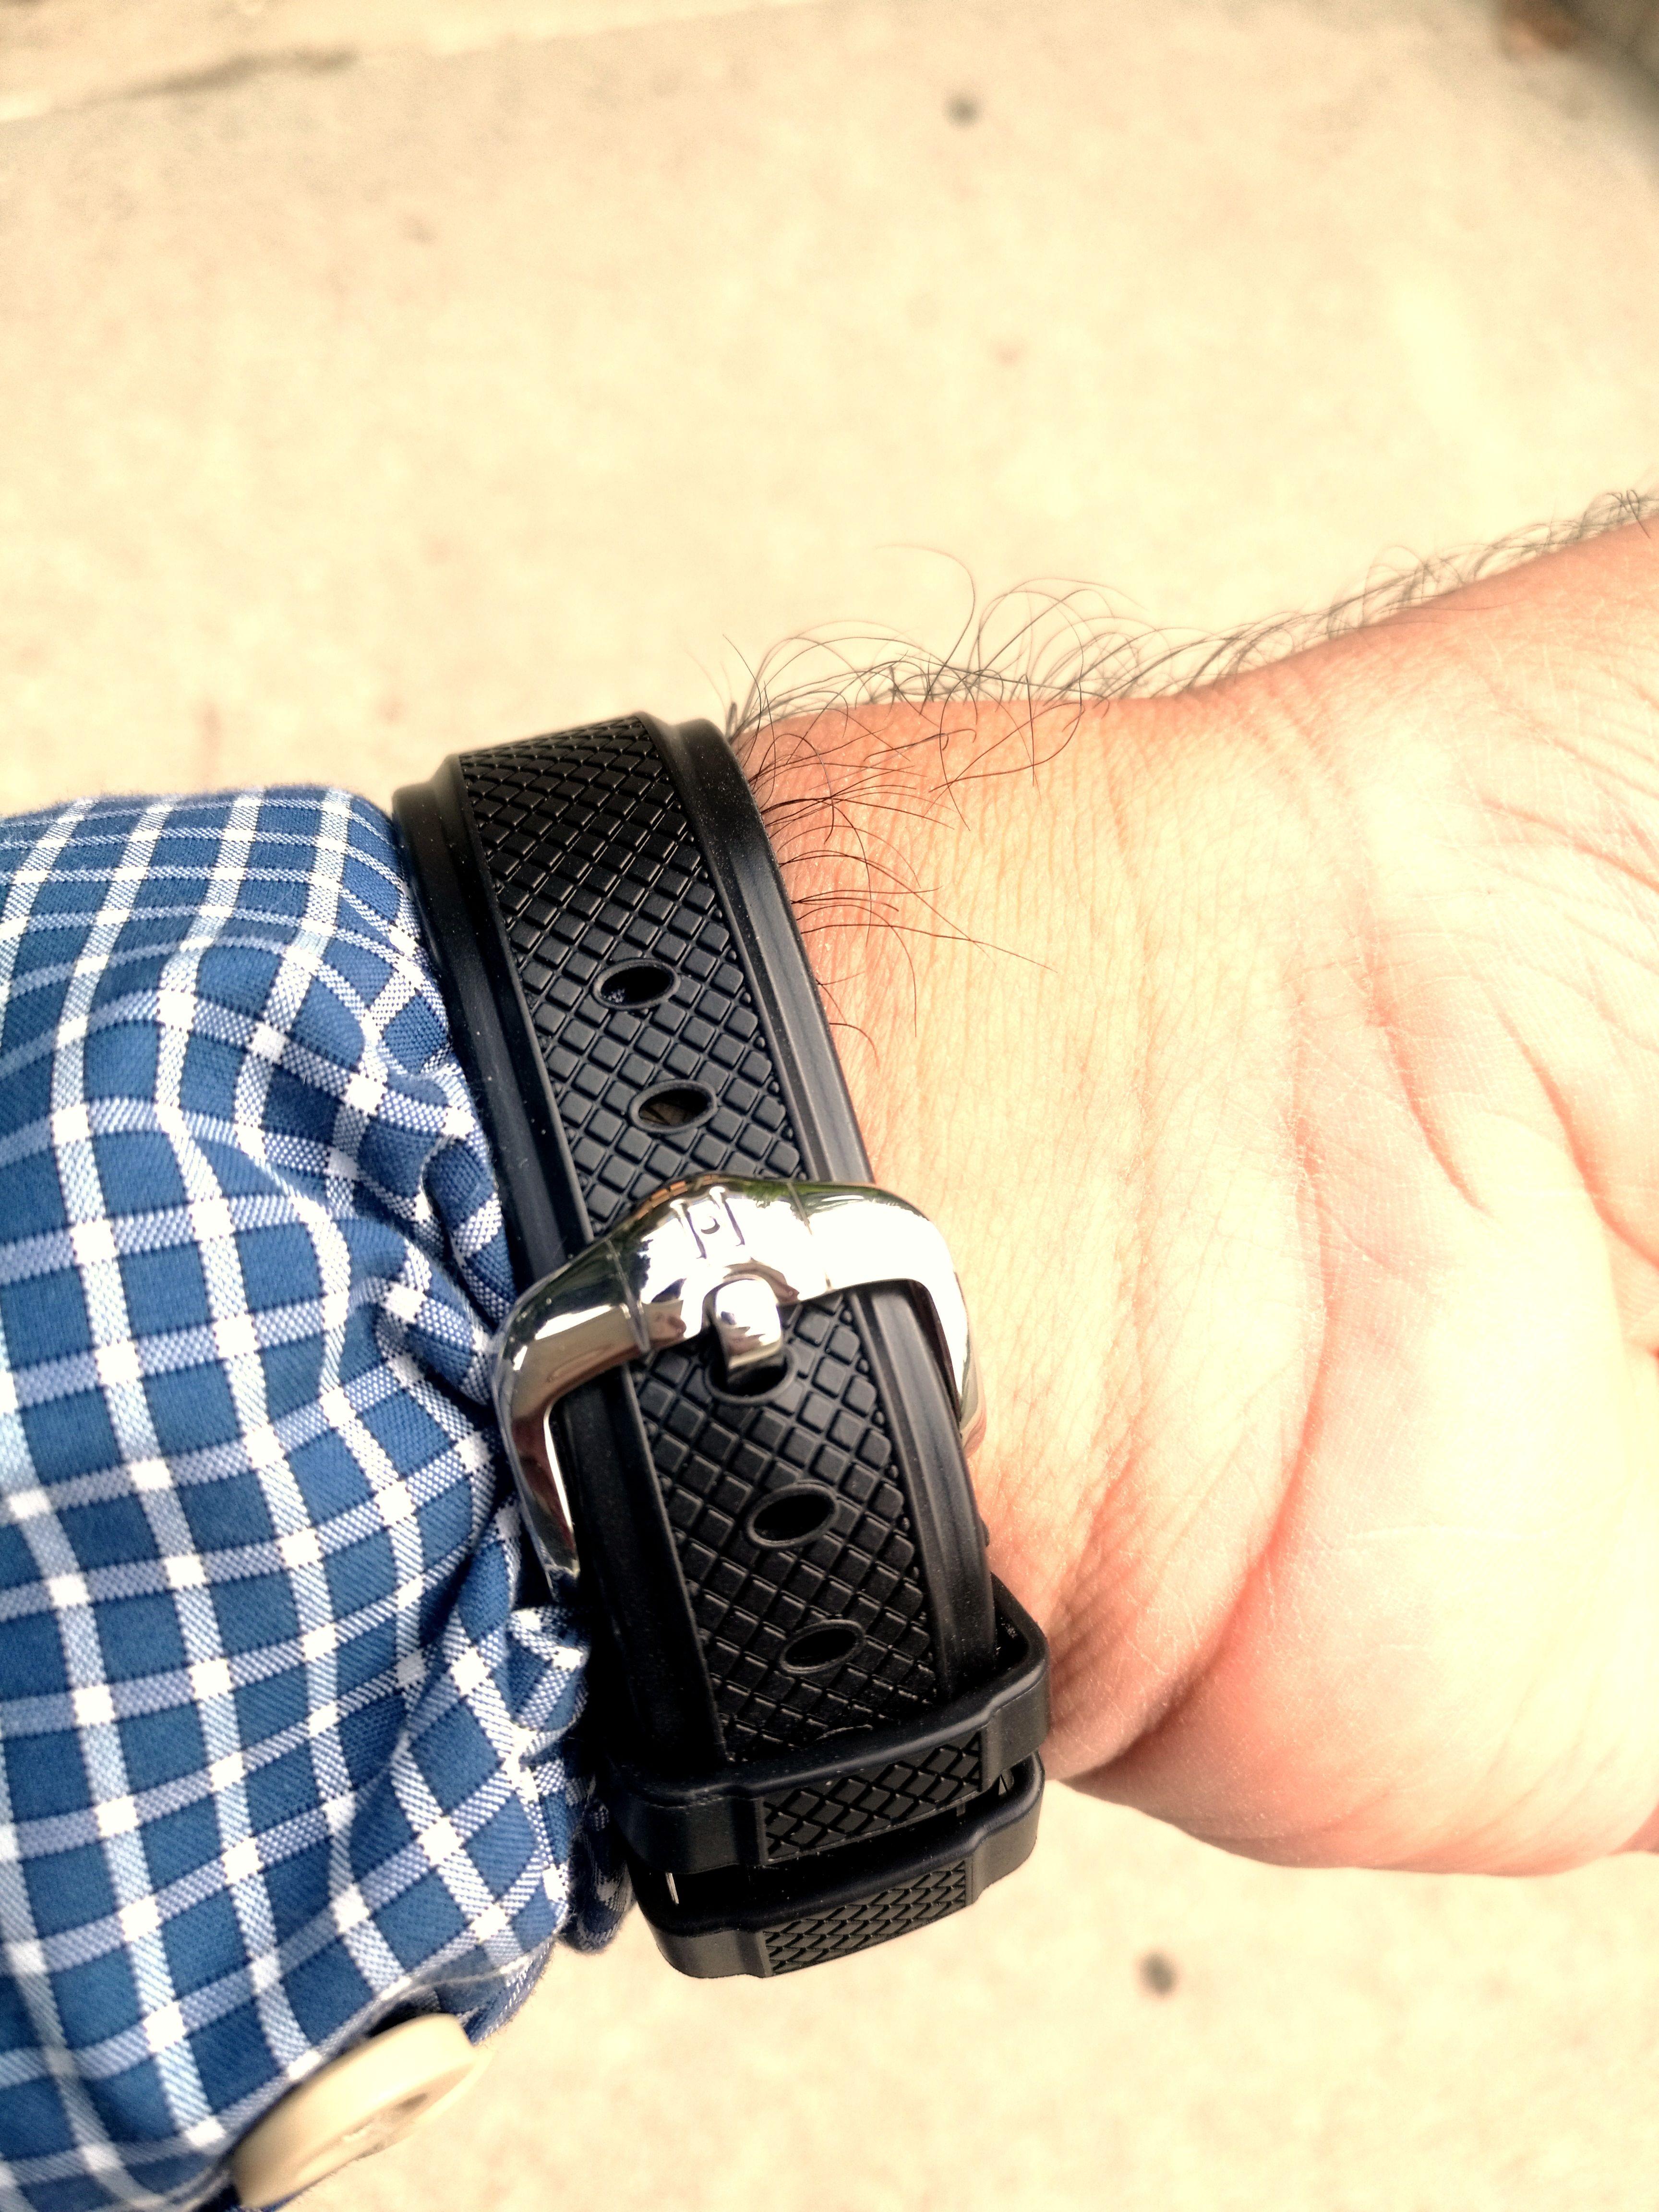 [Hirsch] Hirsch Accent caoutchouc rubber strap